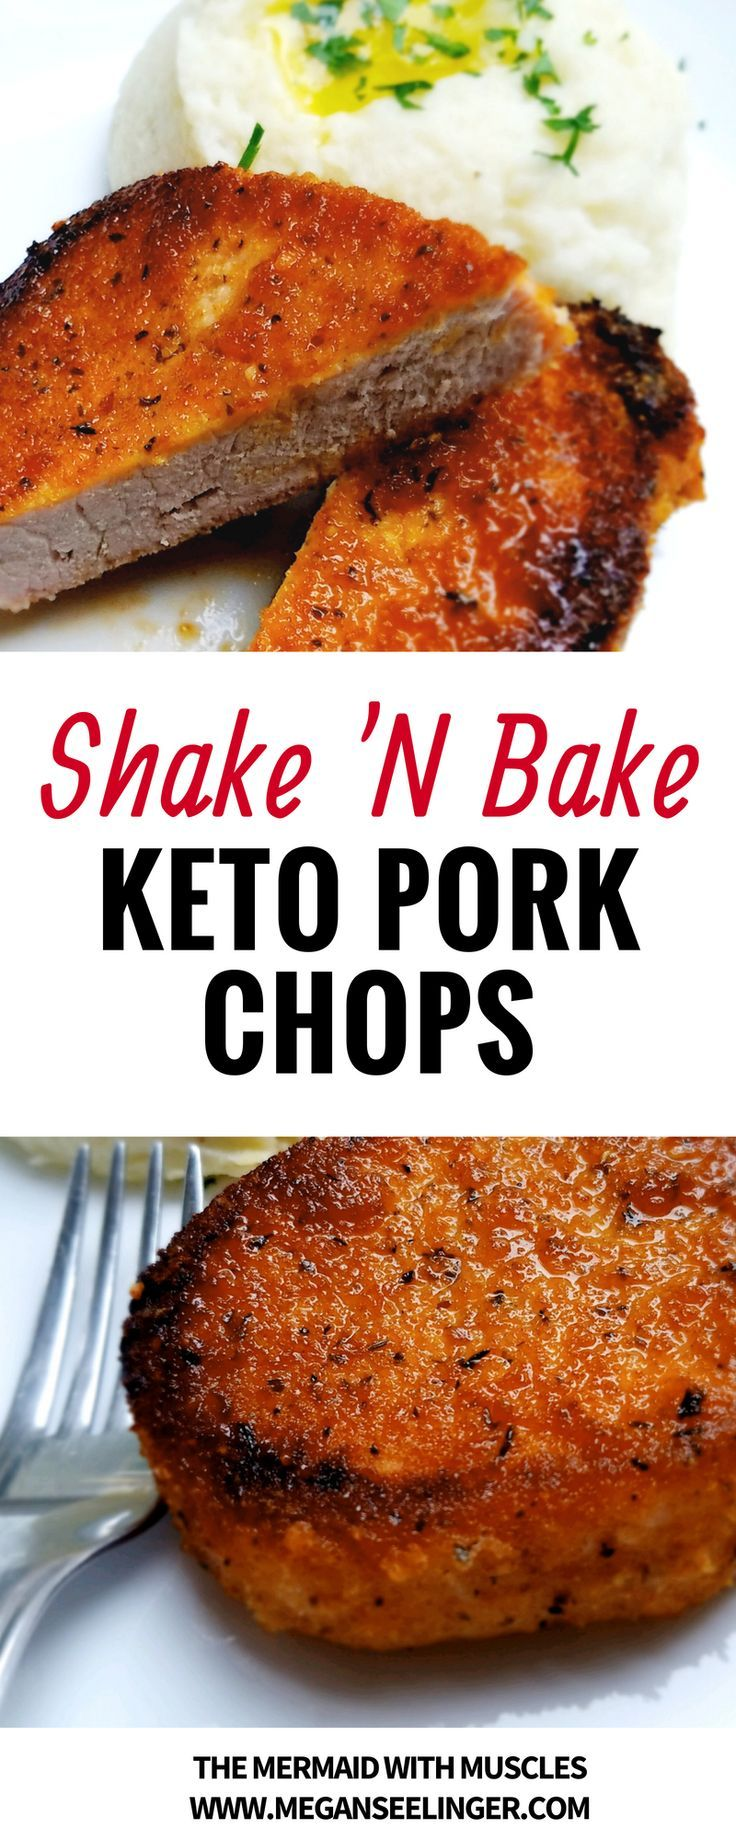 shake and bake on keto diet?